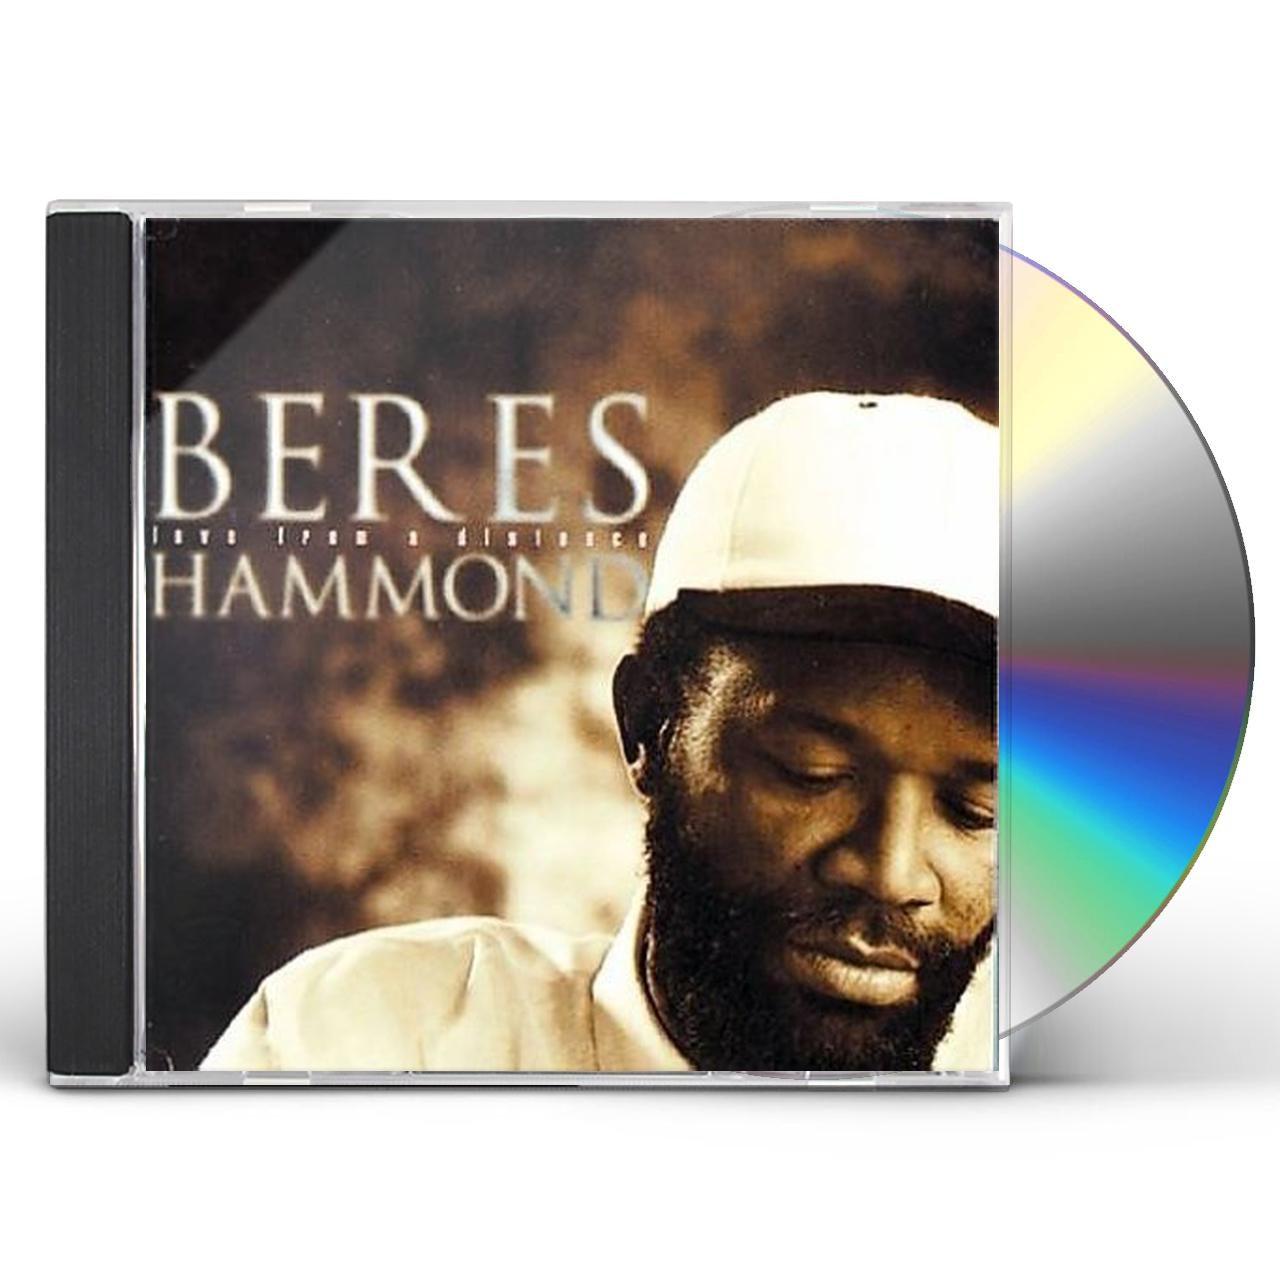 beres hammond albums songs